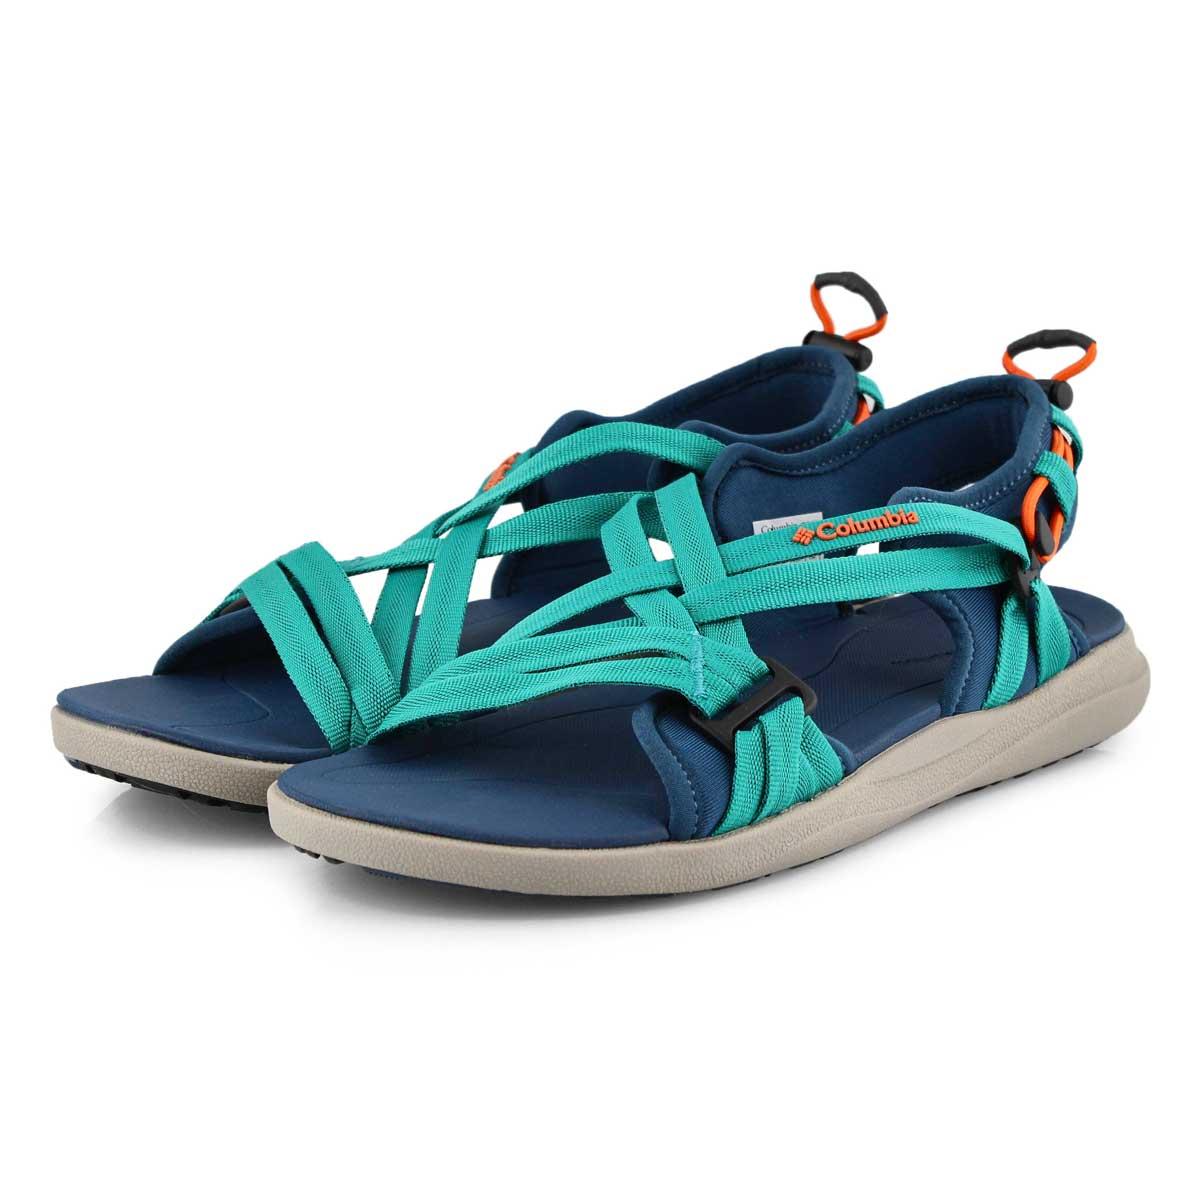 Women's Columbia Sandal Sport Sandal - Blue